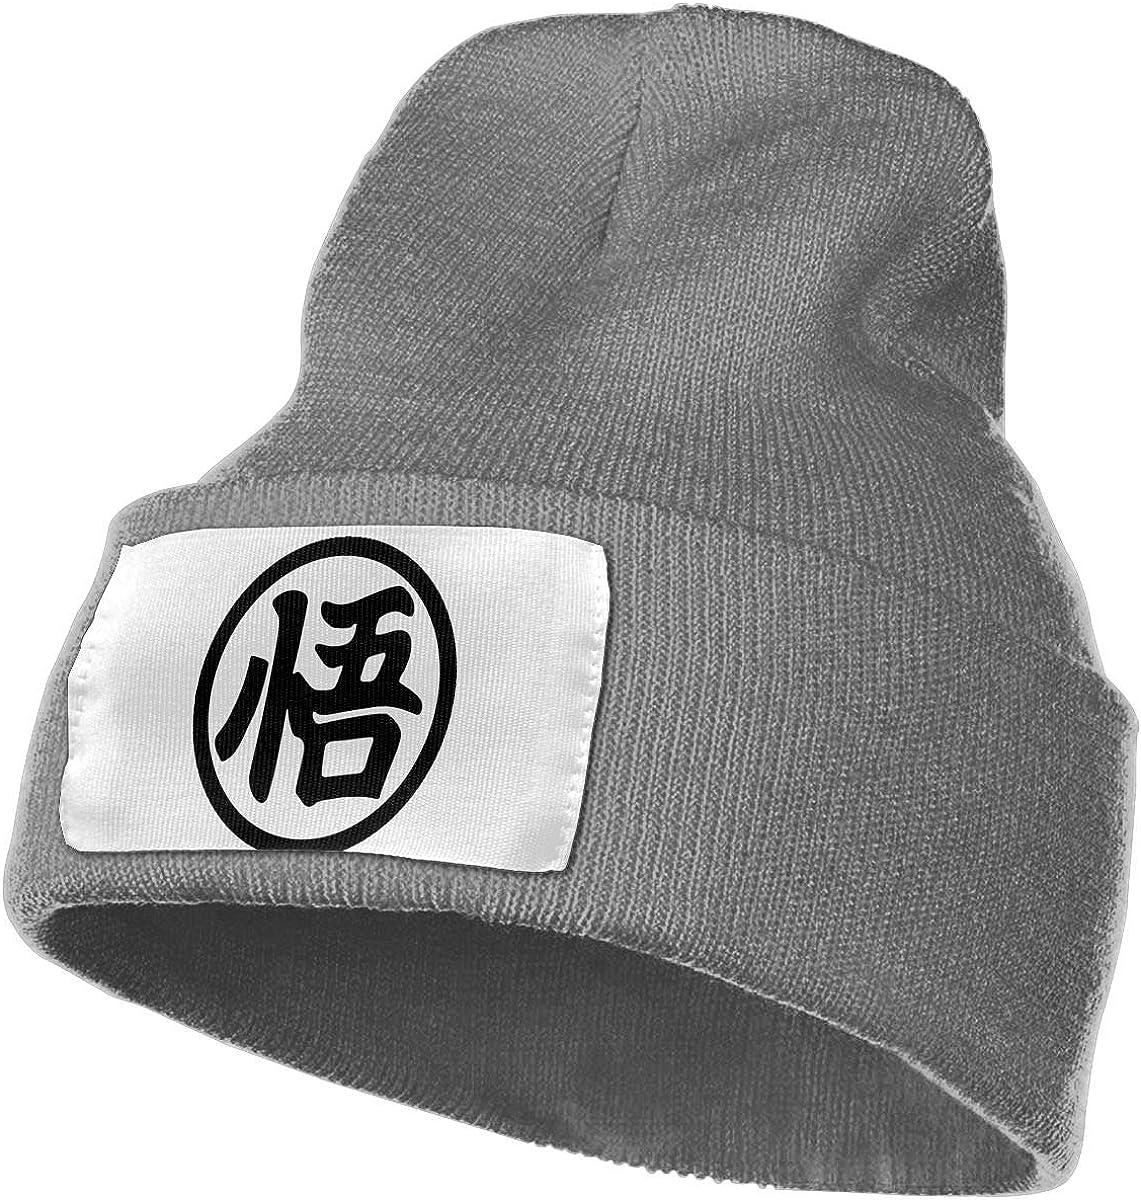 Enghuaquj Goku Kanji Knitted Hat Cap Beanie Black